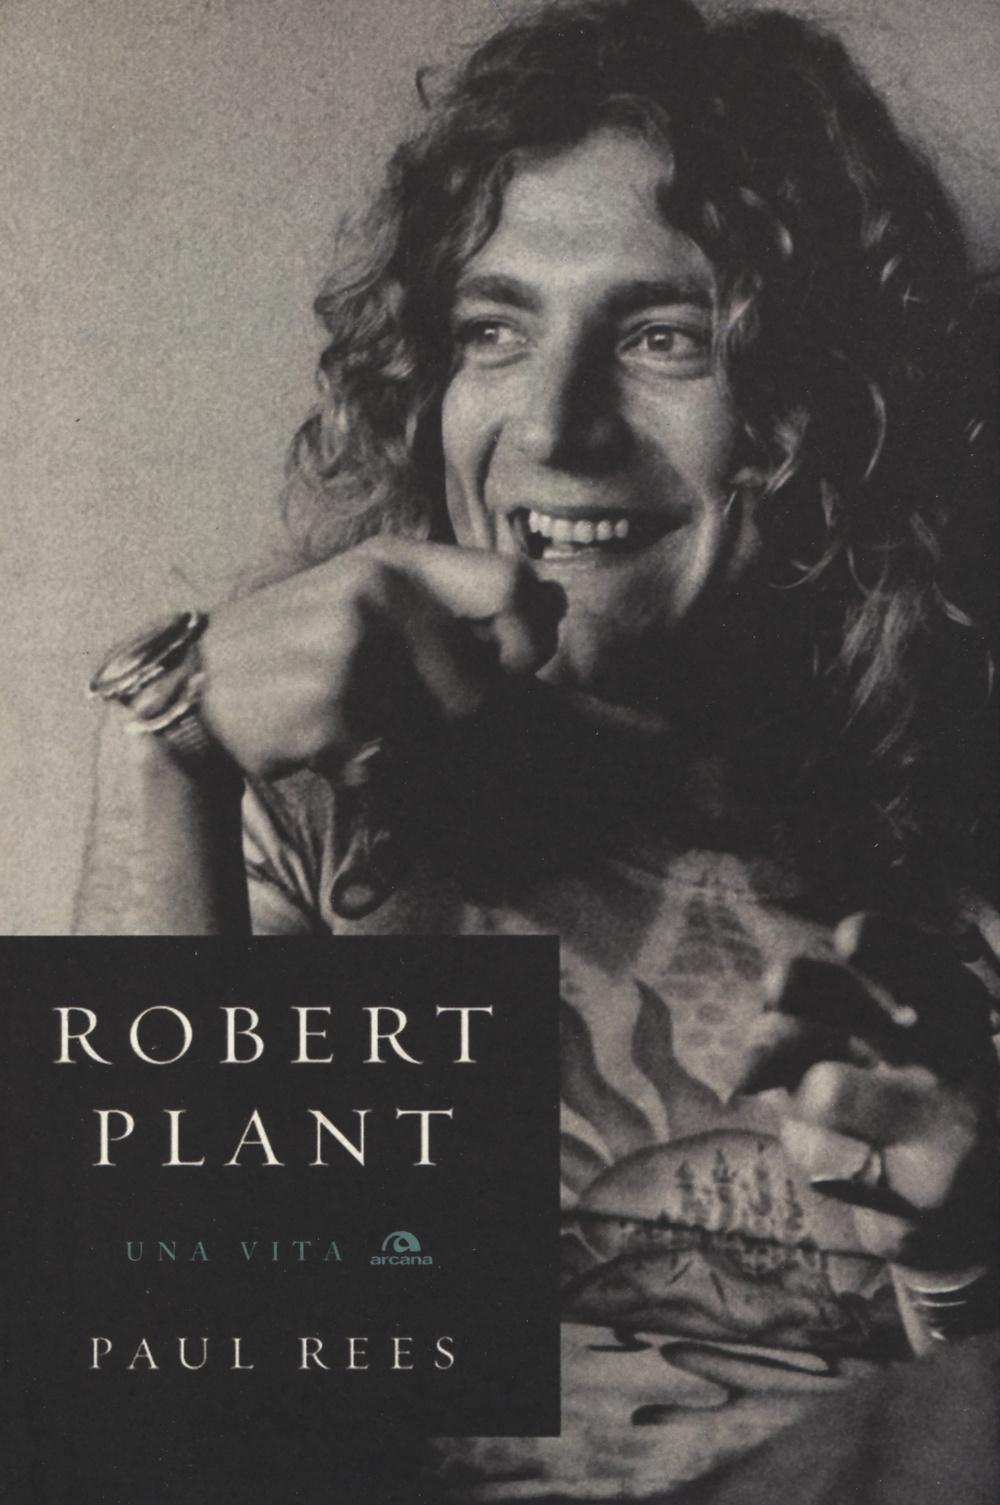 ROBERT PLANT. UNA VITA - 9788862313551